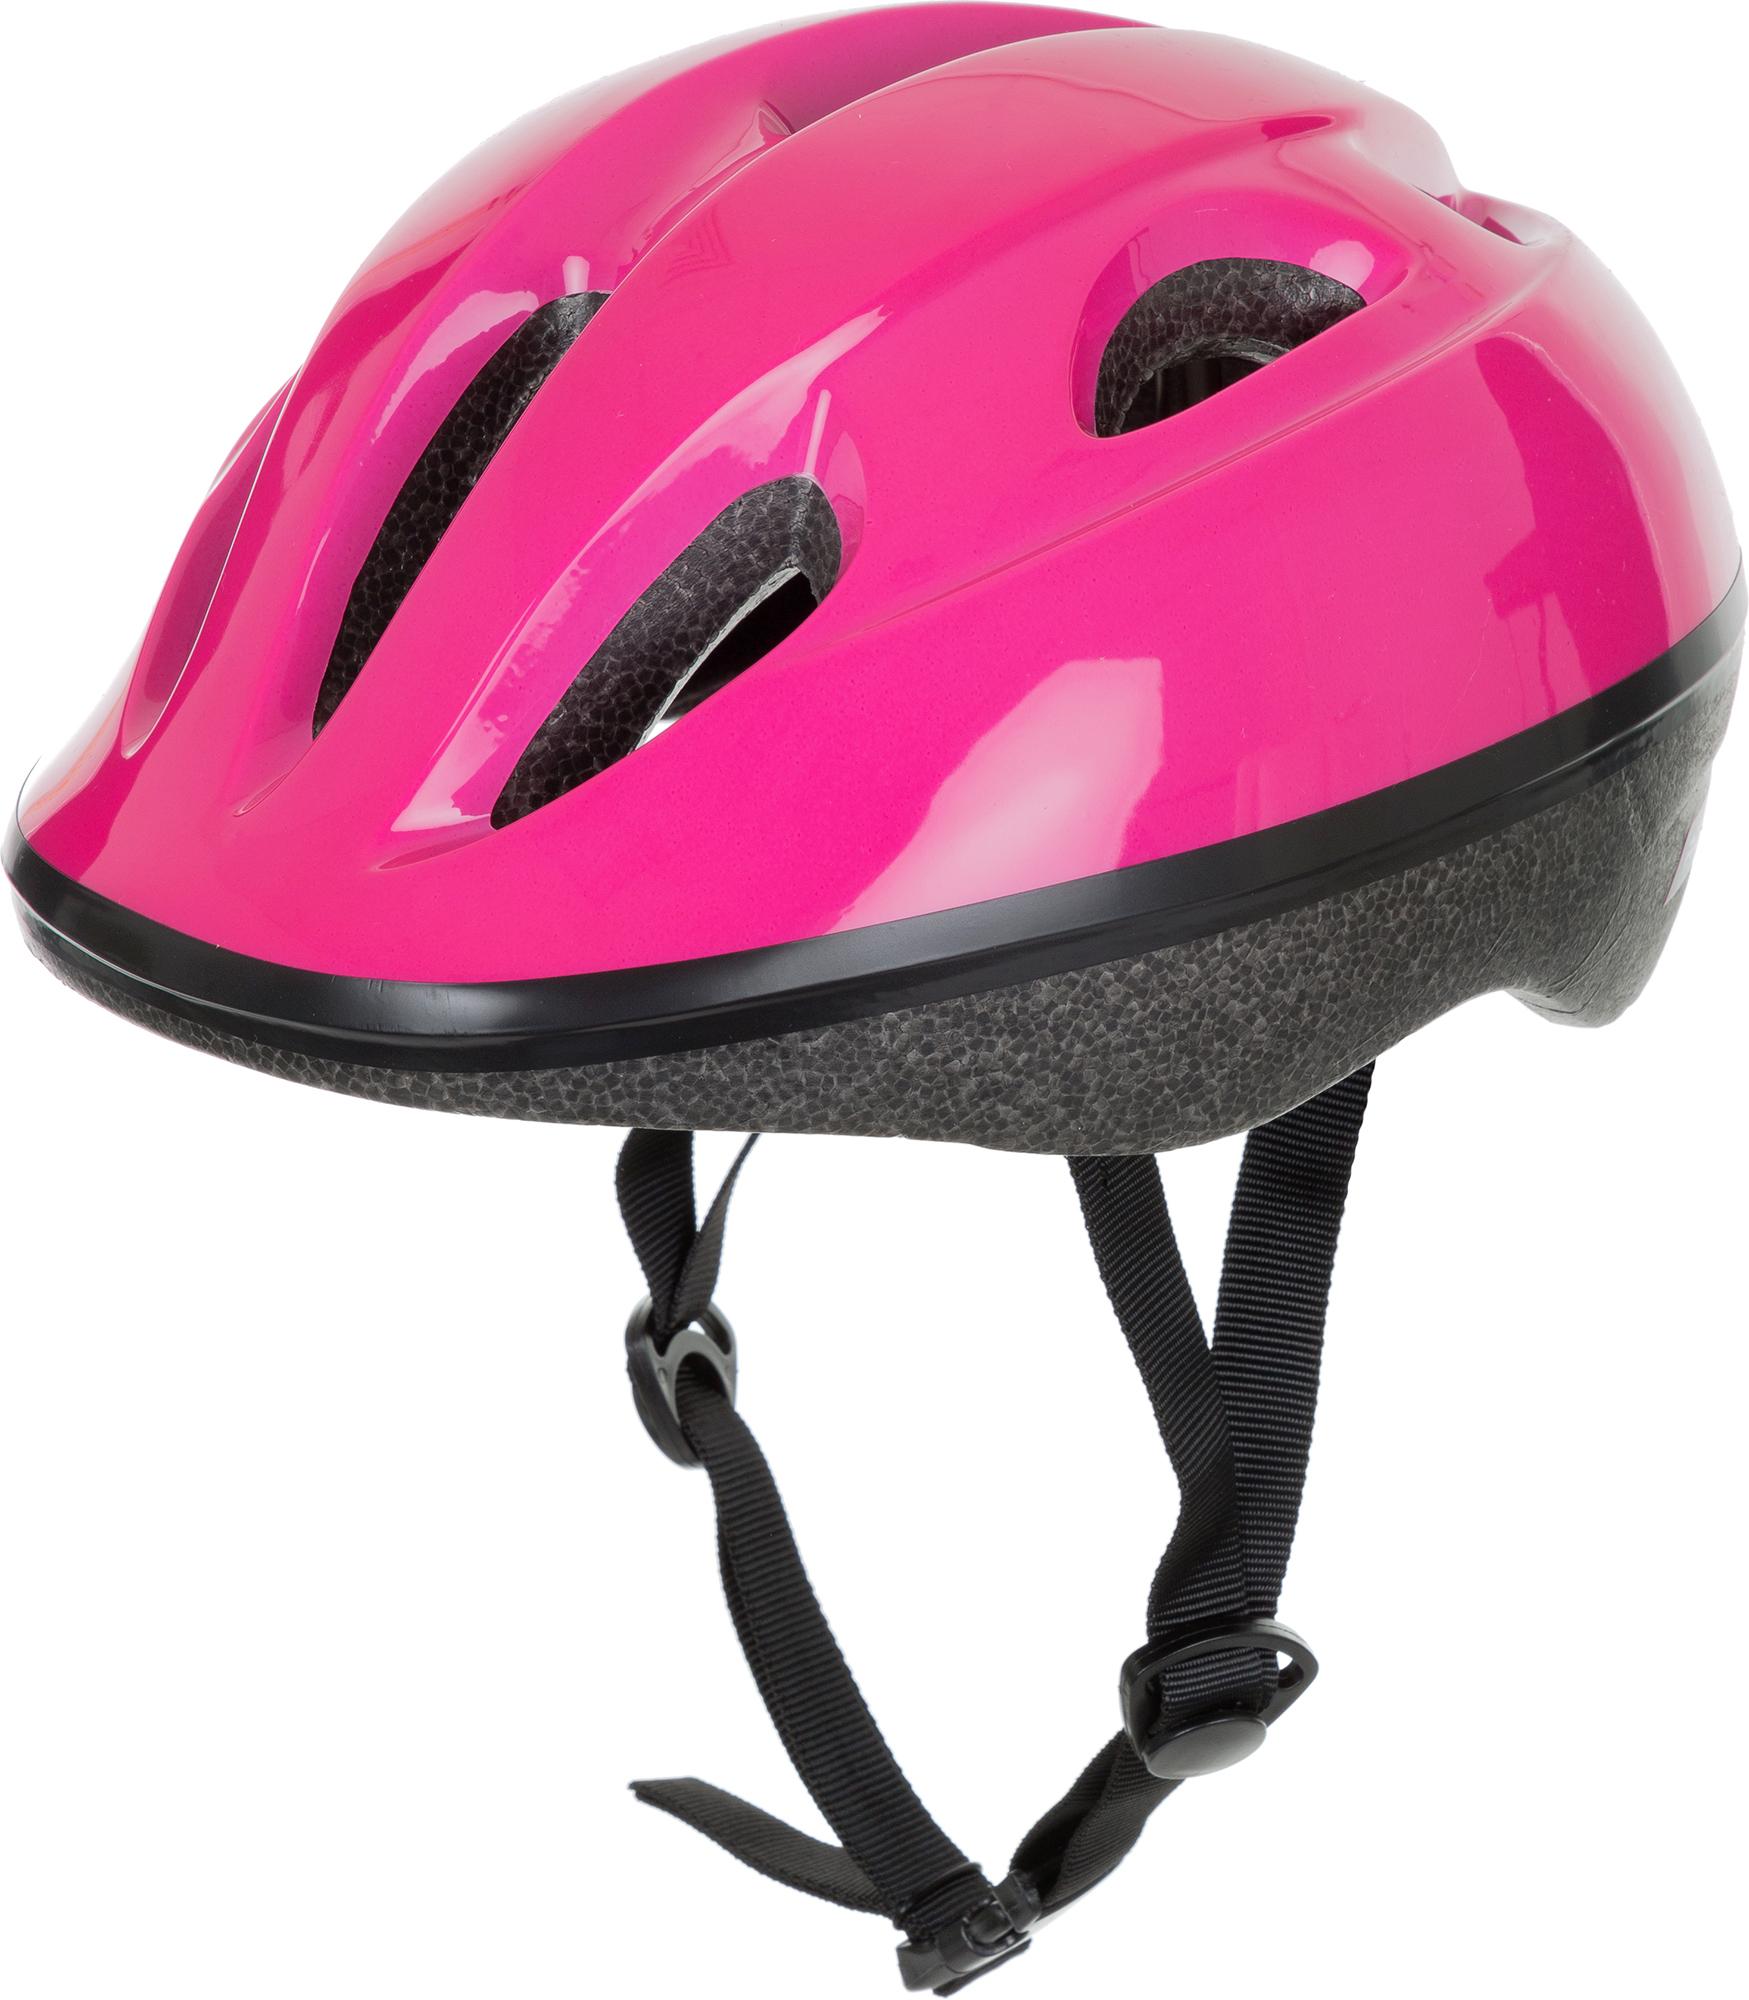 REACTION Шлем для девочек REACTION, размер S